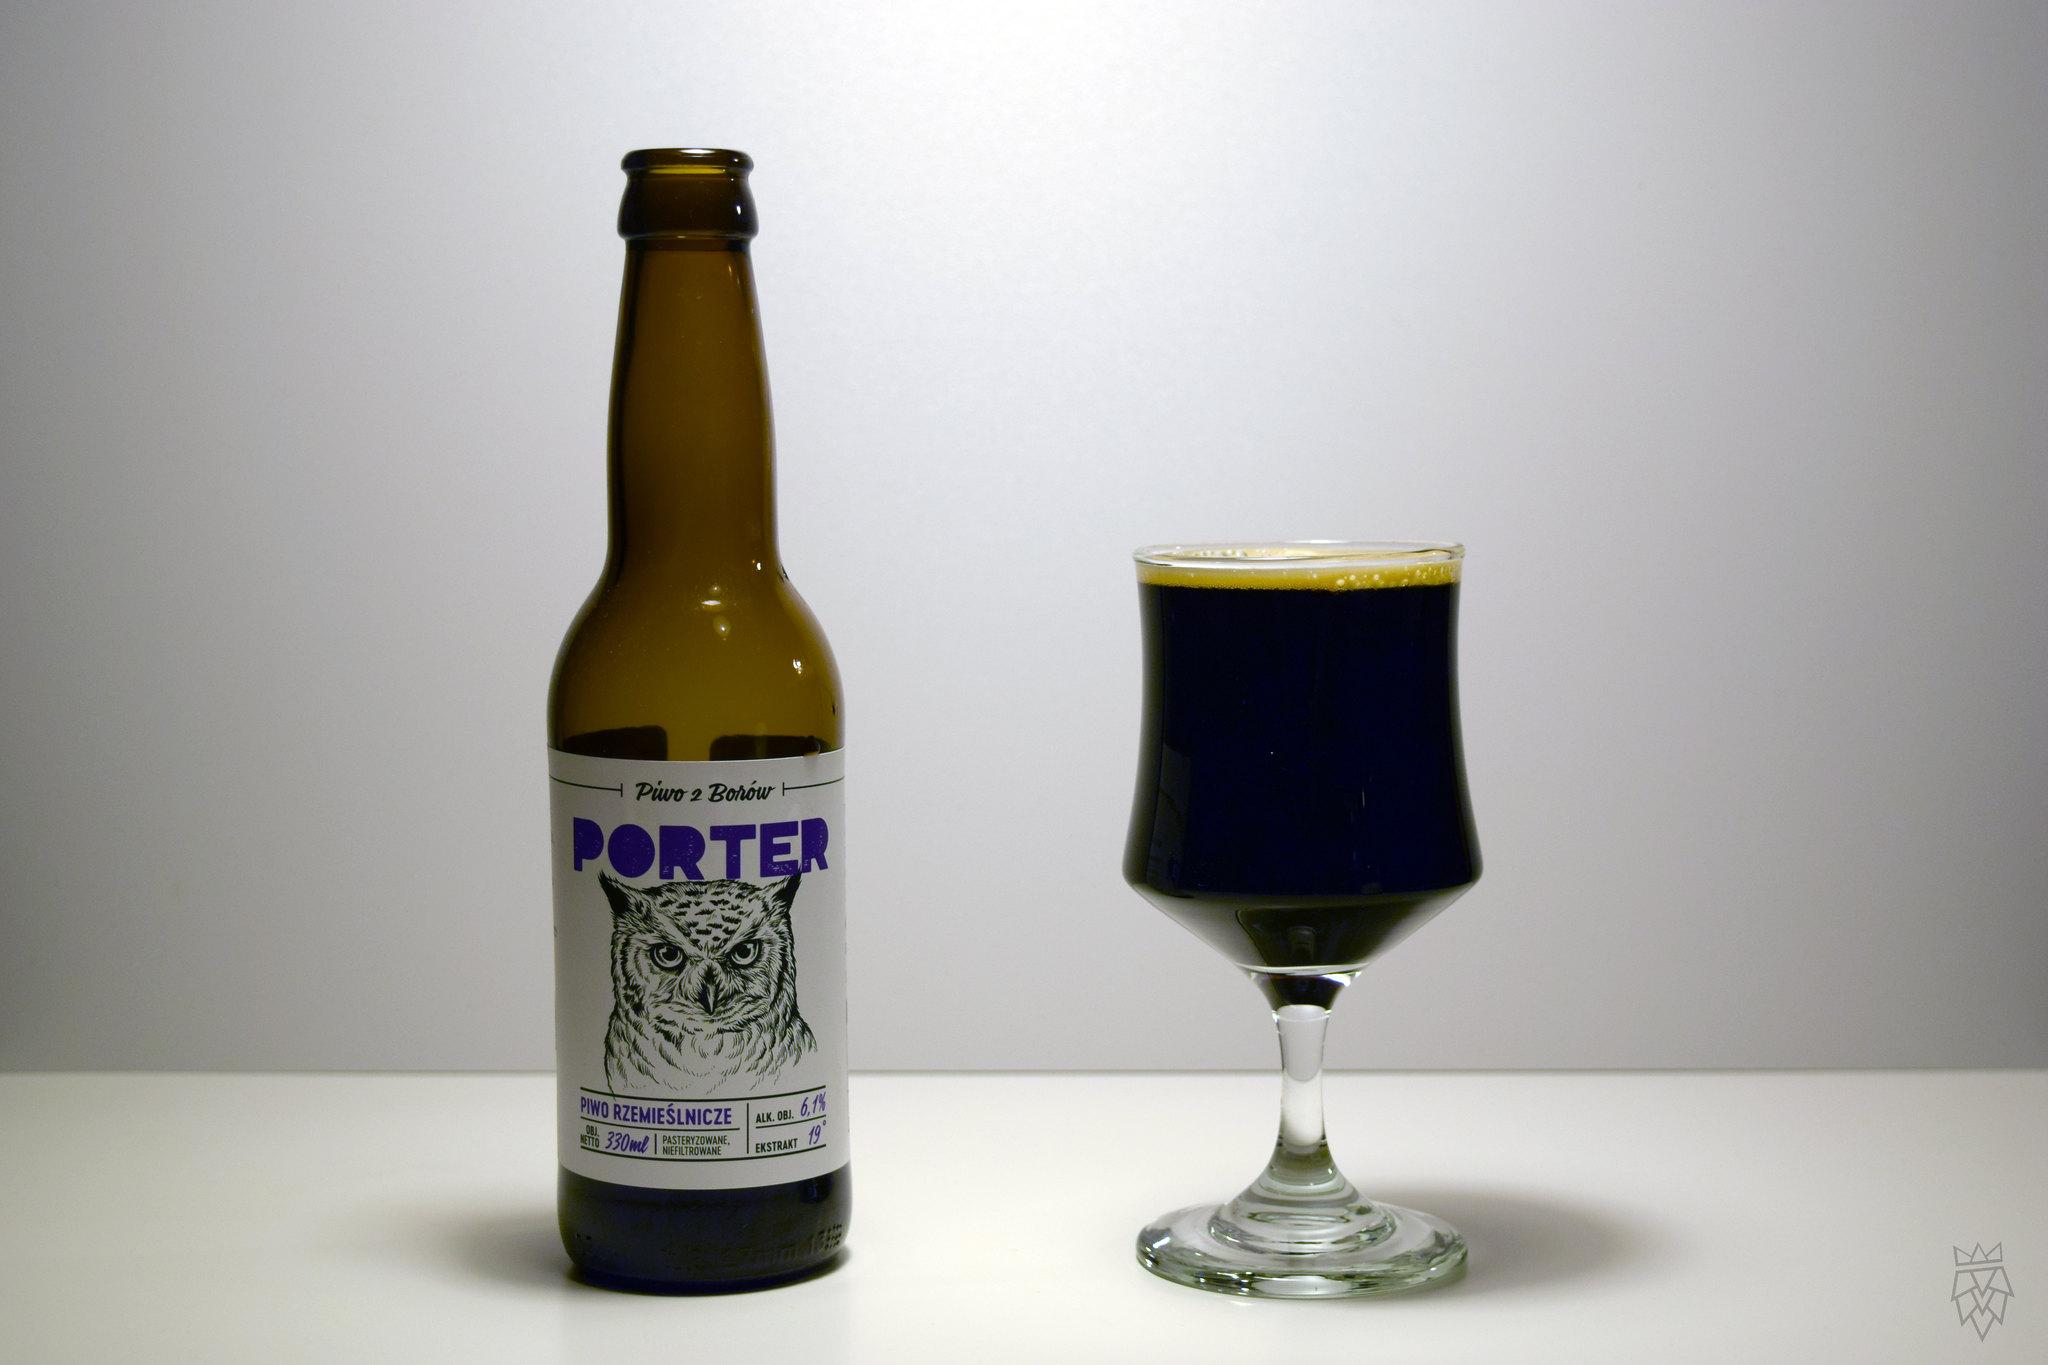 przystanek tleń porter